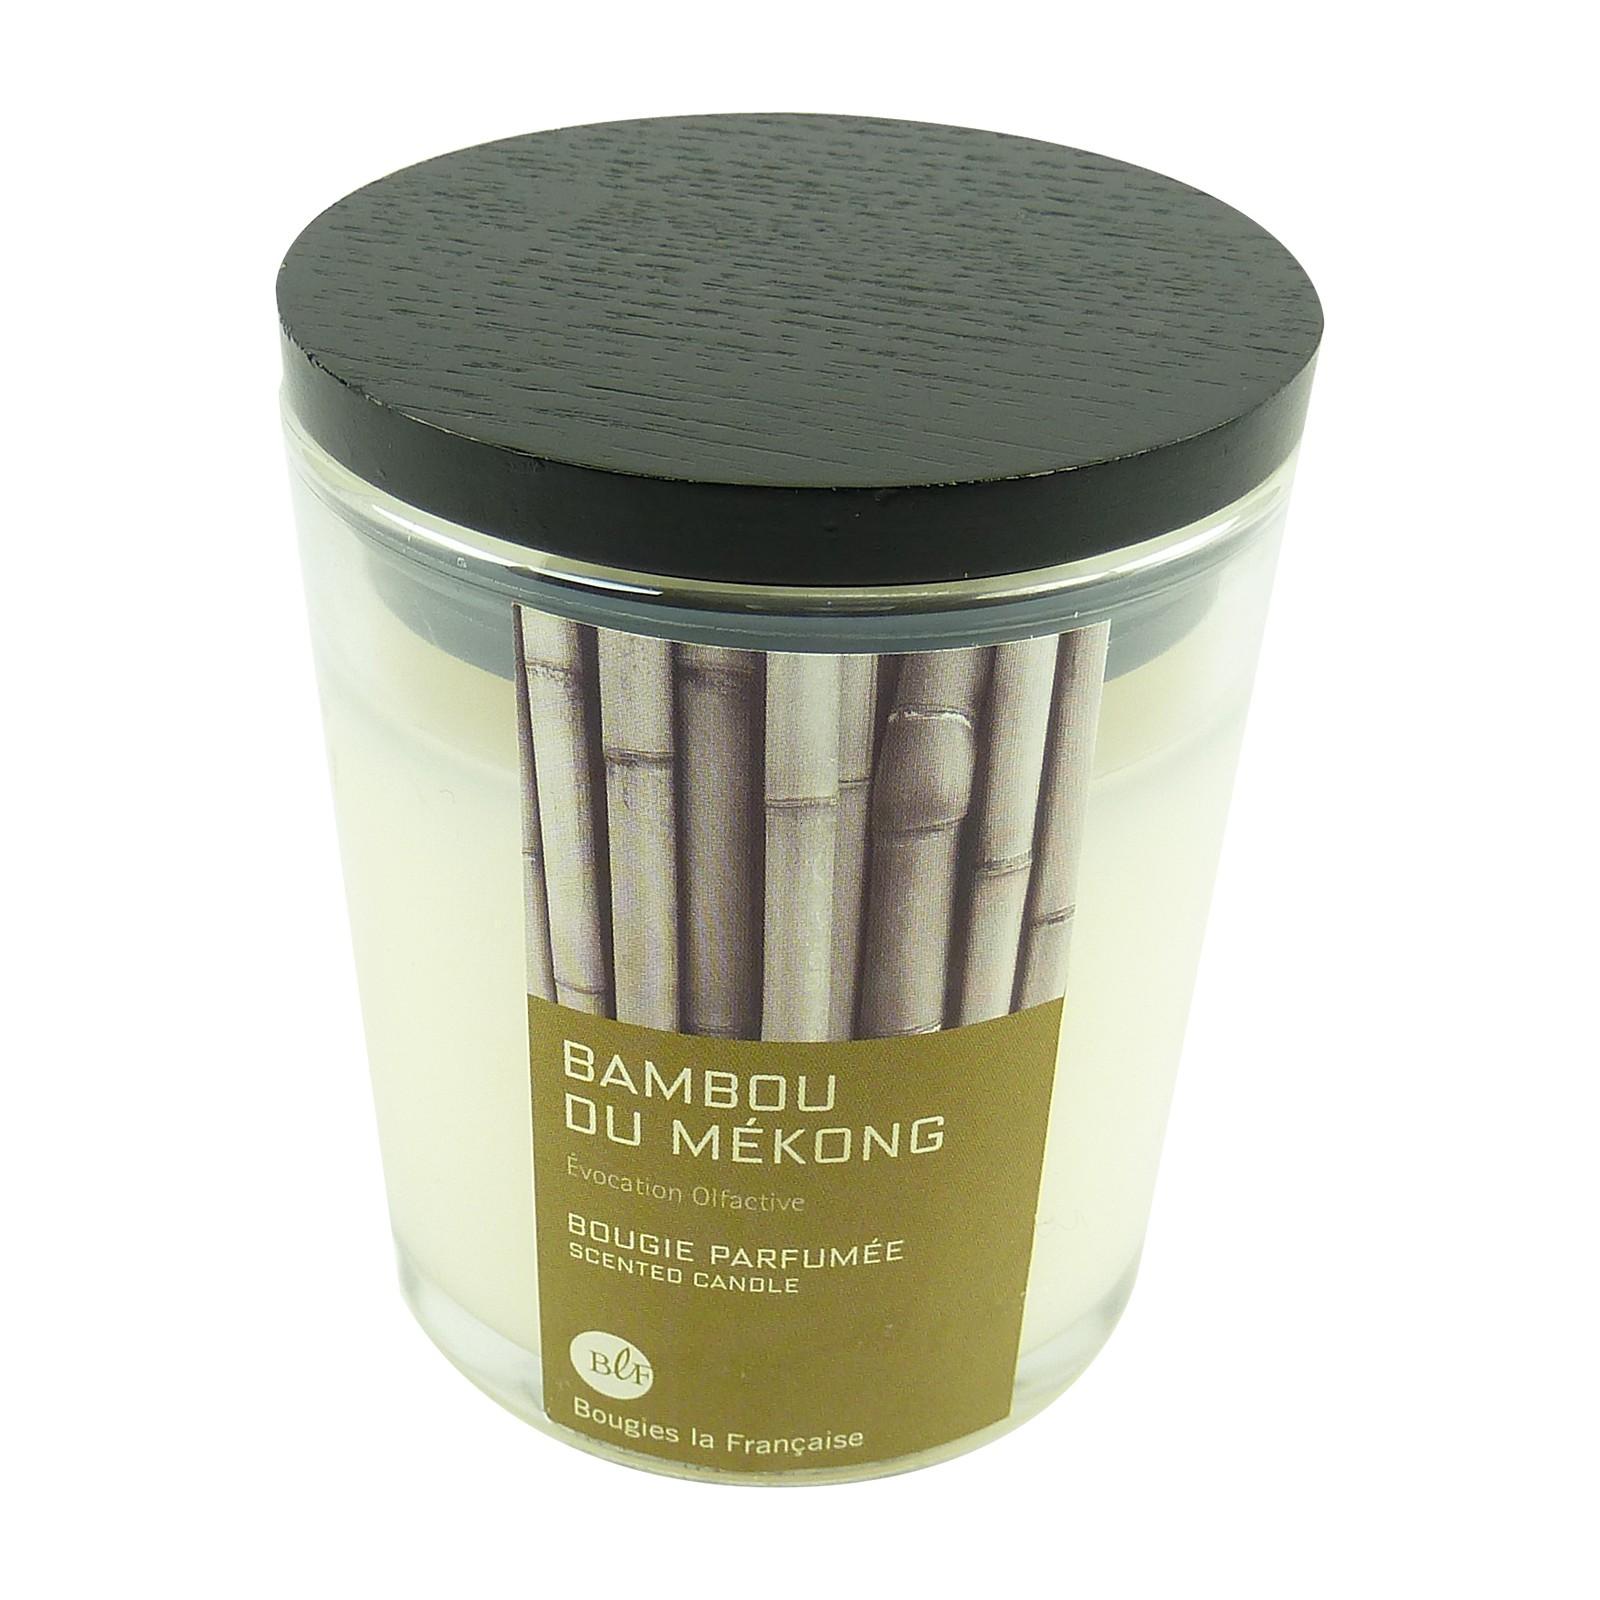 Bougies La Francaise Bambus Duft Kerze Bambou Du Mekong Im Glas Mit